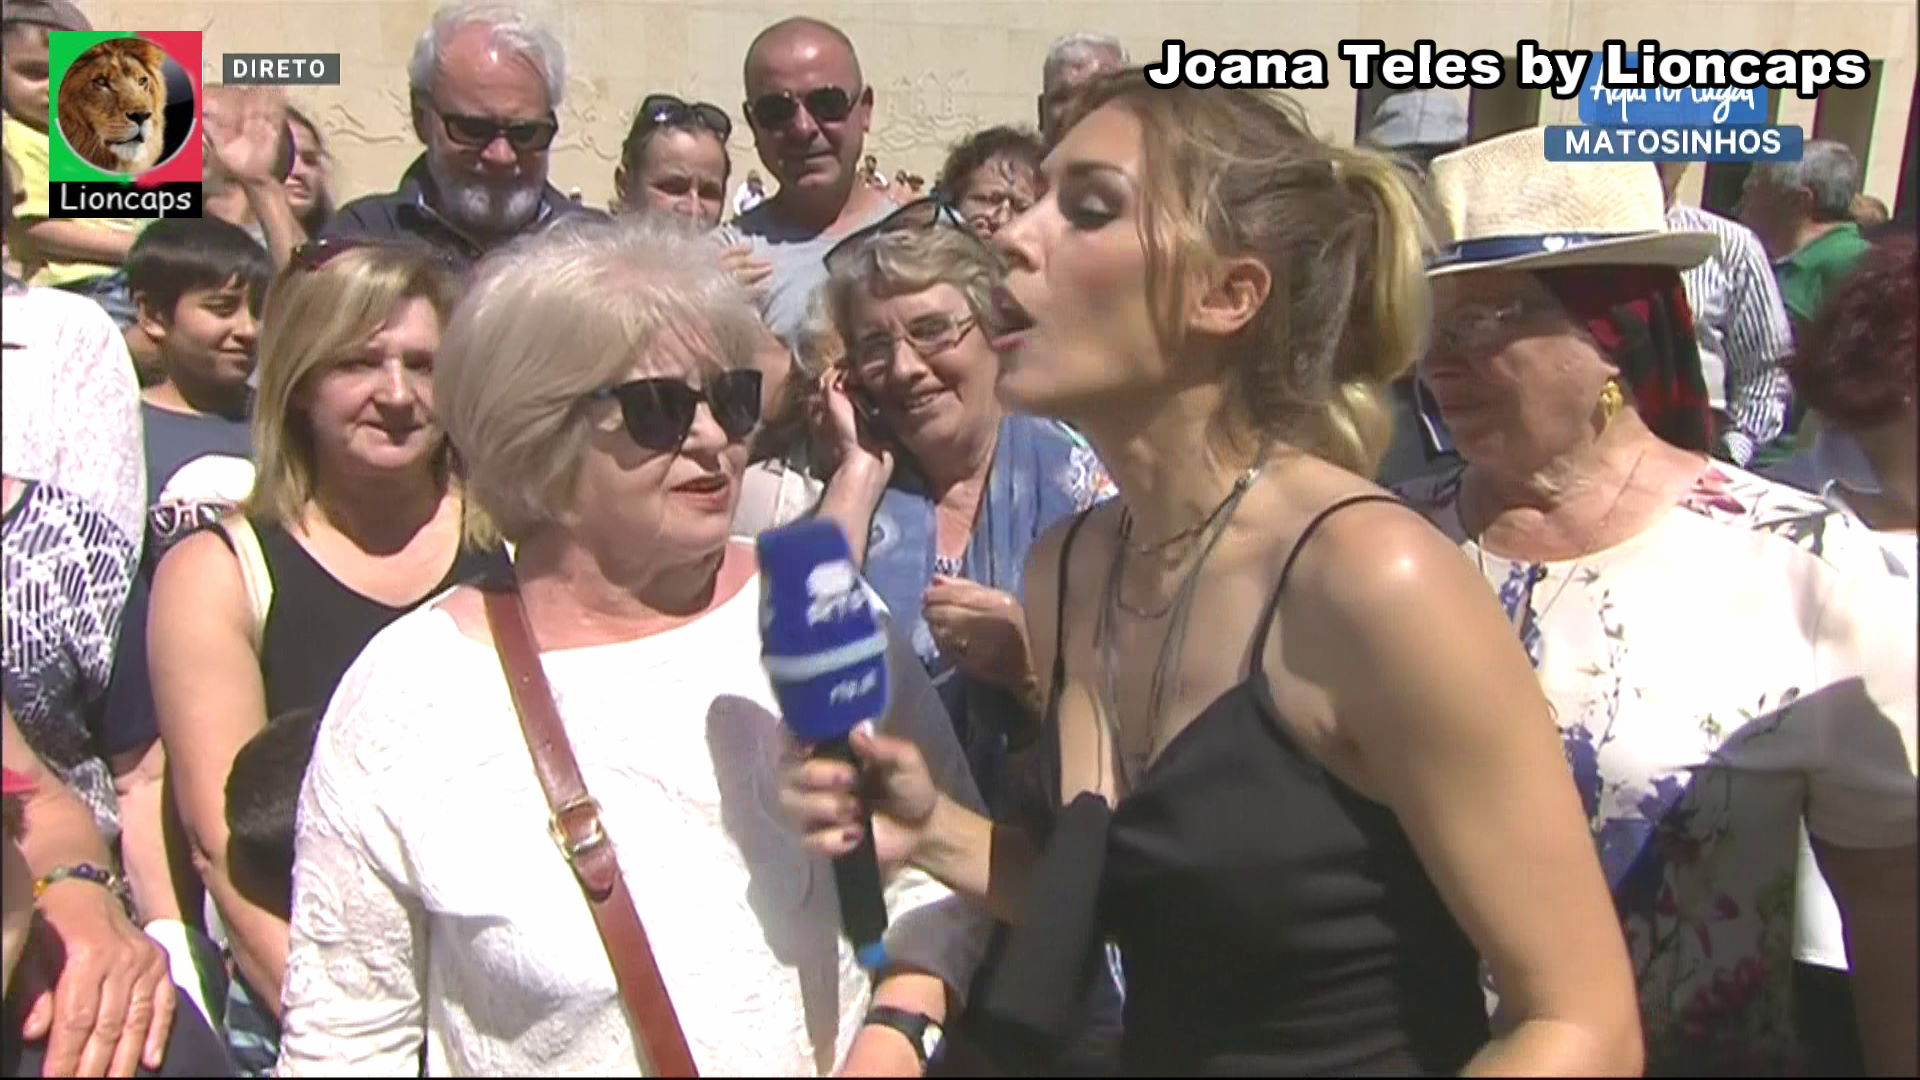 976669149_joana_teles_vs200125_1165_122_151lo.JPG